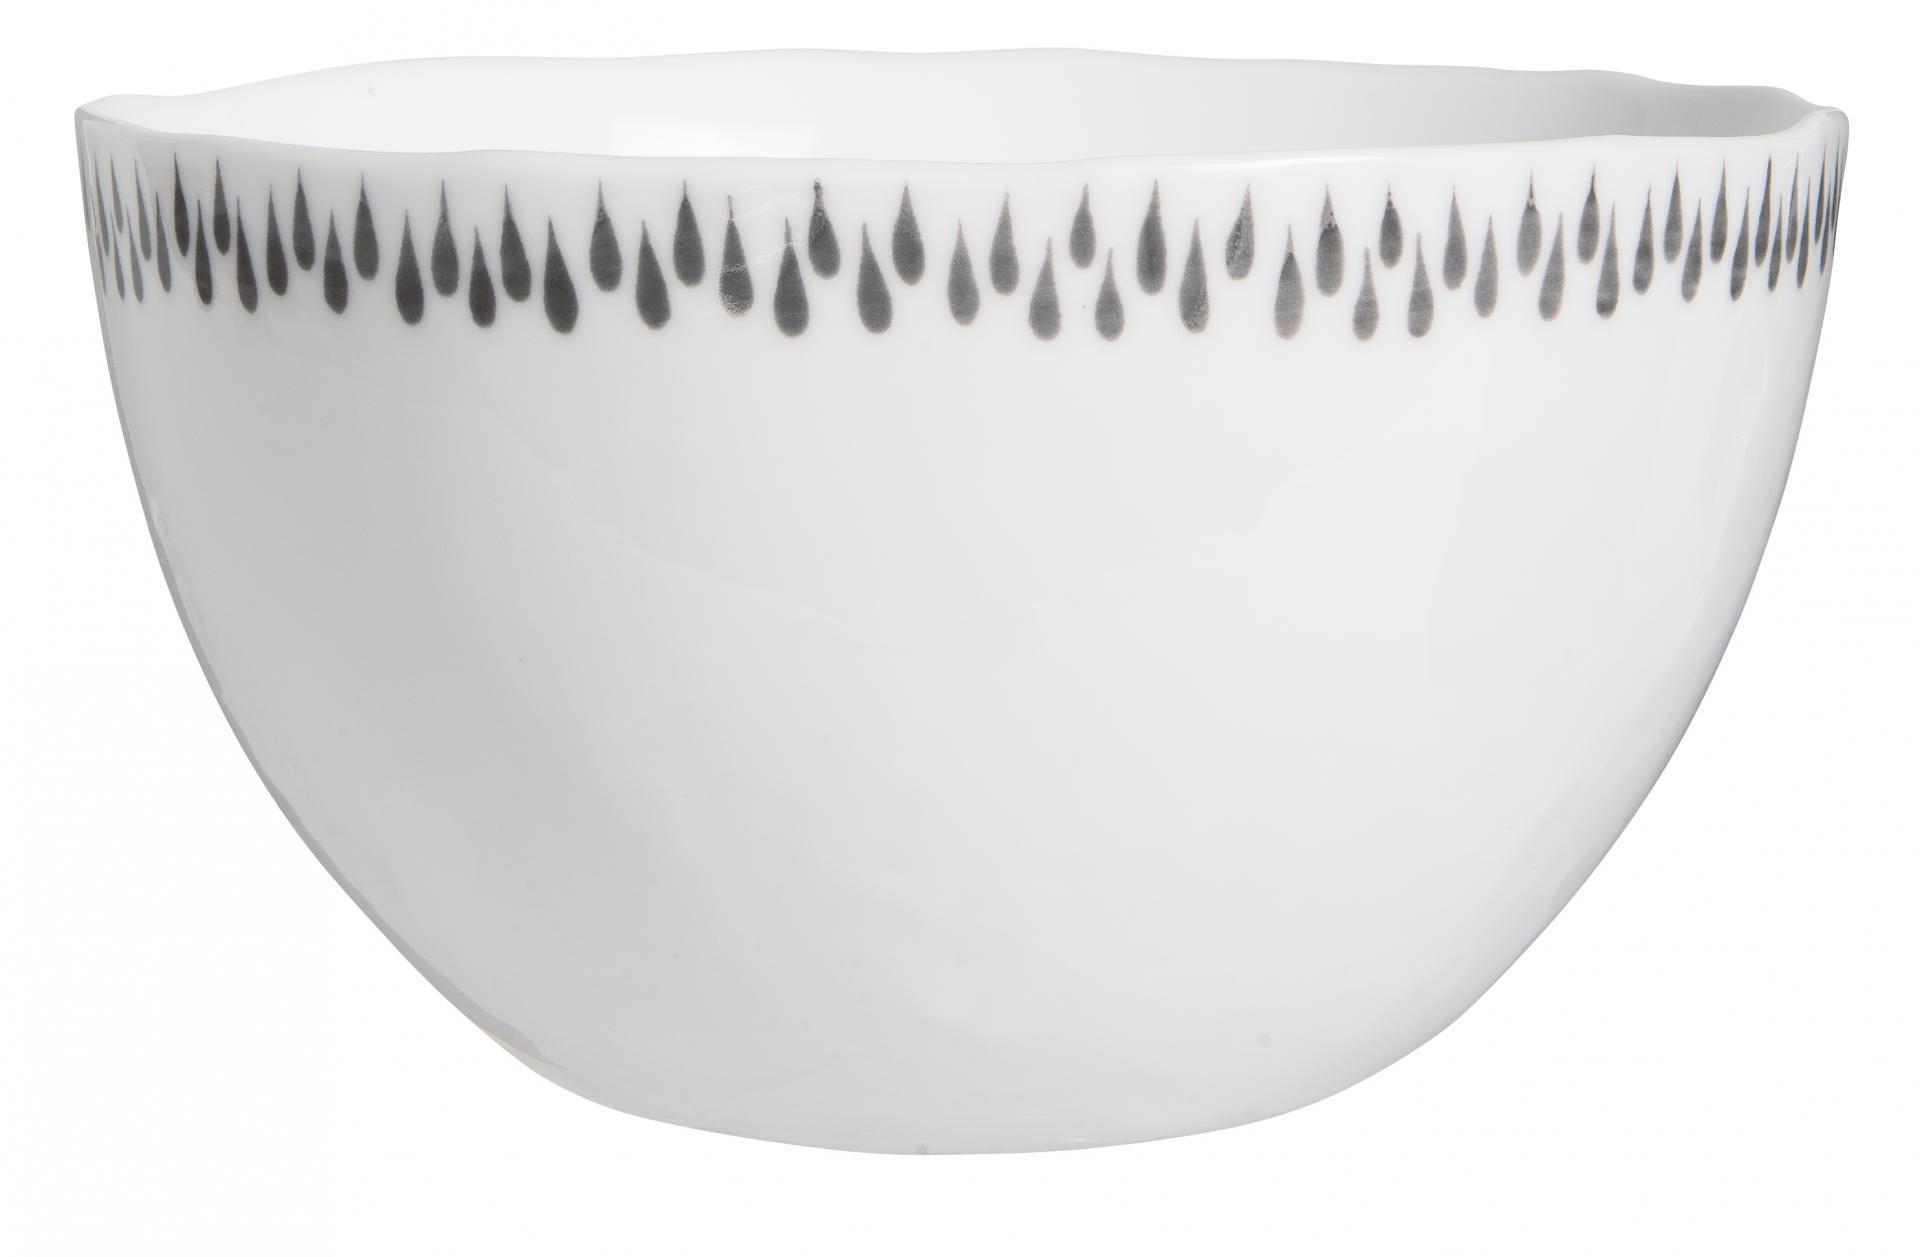 IB LAURSEN Porcelánová miska Delicate Grey, šedá barva, bílá barva, porcelán